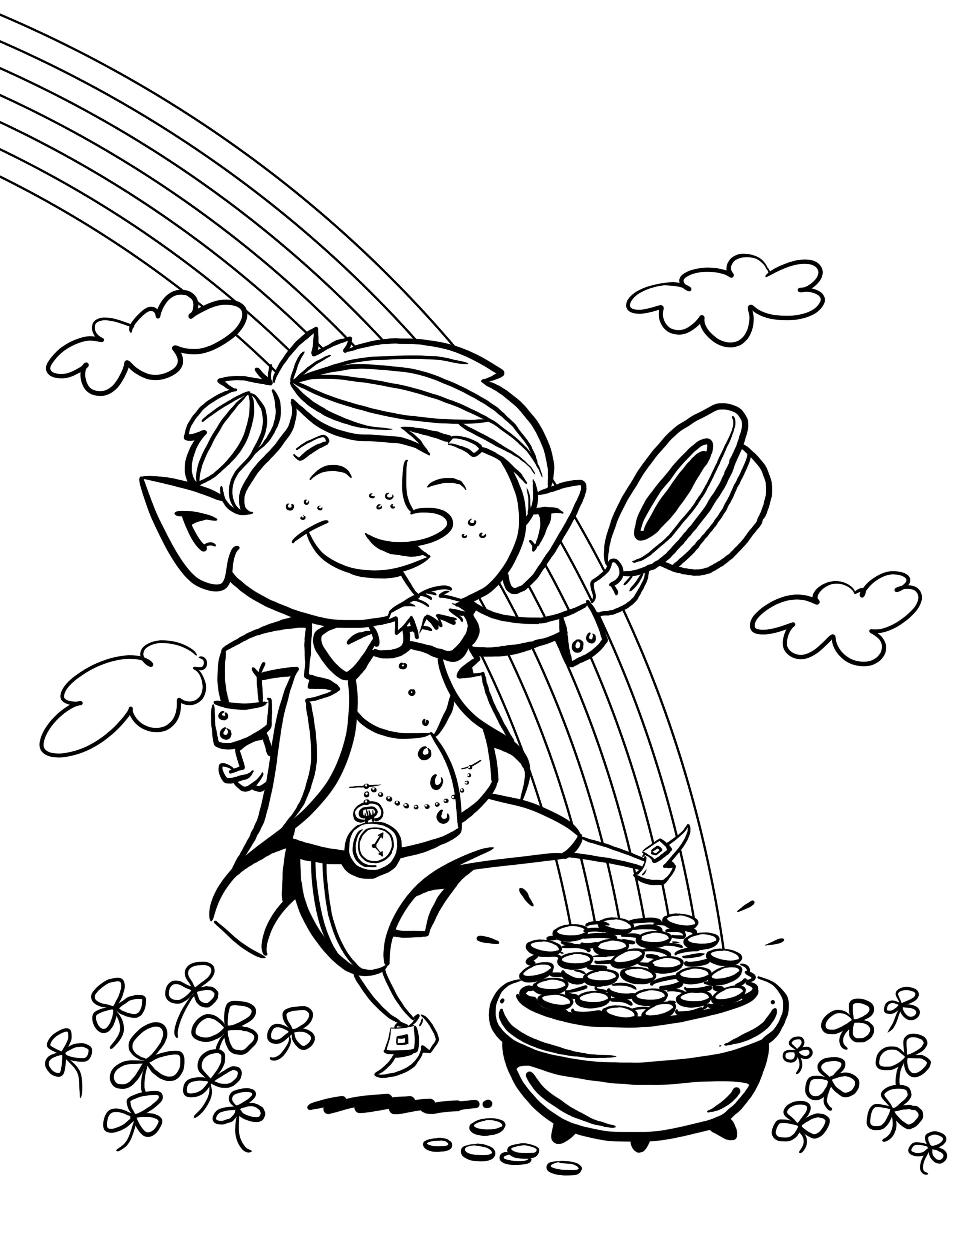 960x1243 Leprechaun Coloring Pages Best Coloring Pages For Kids Leprechaun